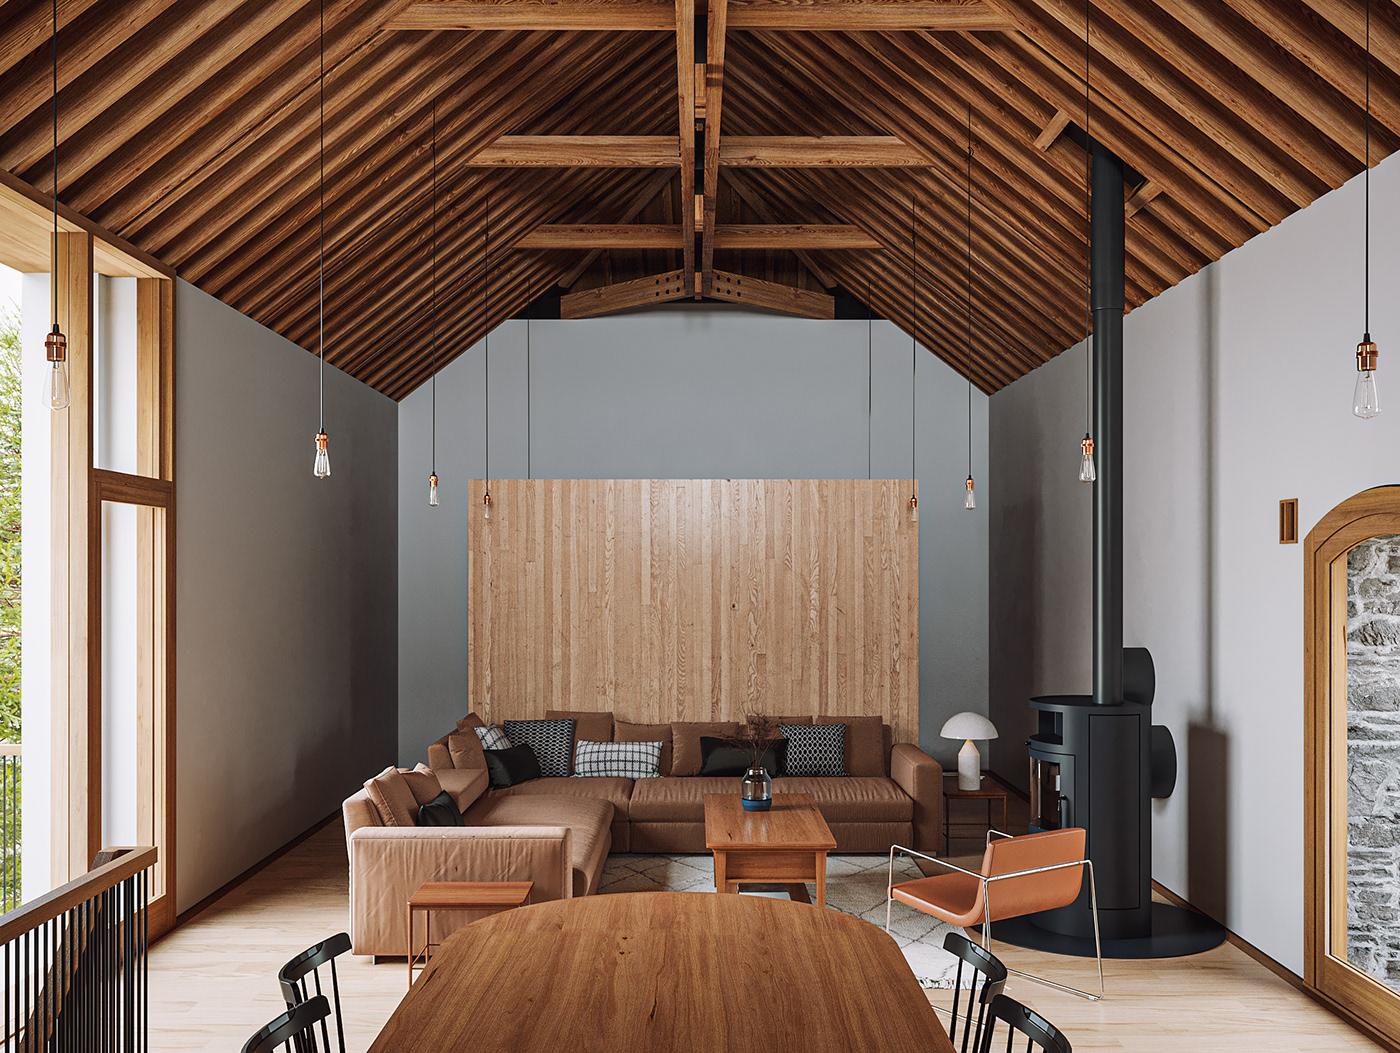 3D architecture archviz CGI corona render  Interior modern Render visualization vray